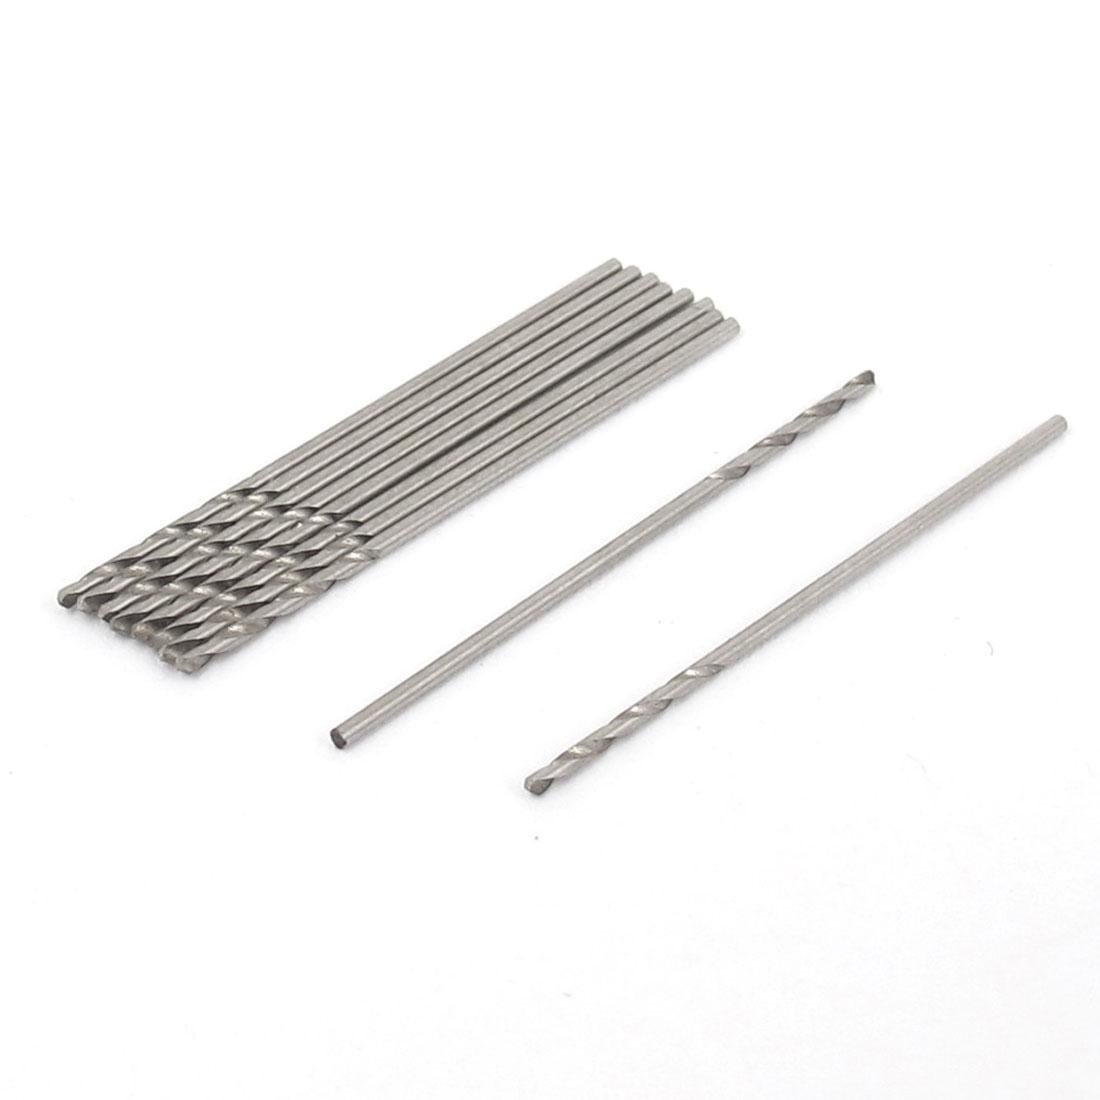 0.75mm Dia 35mm Length M2 HSS Straight Shank Drilling Drill Bit Silver Tone 10pcs